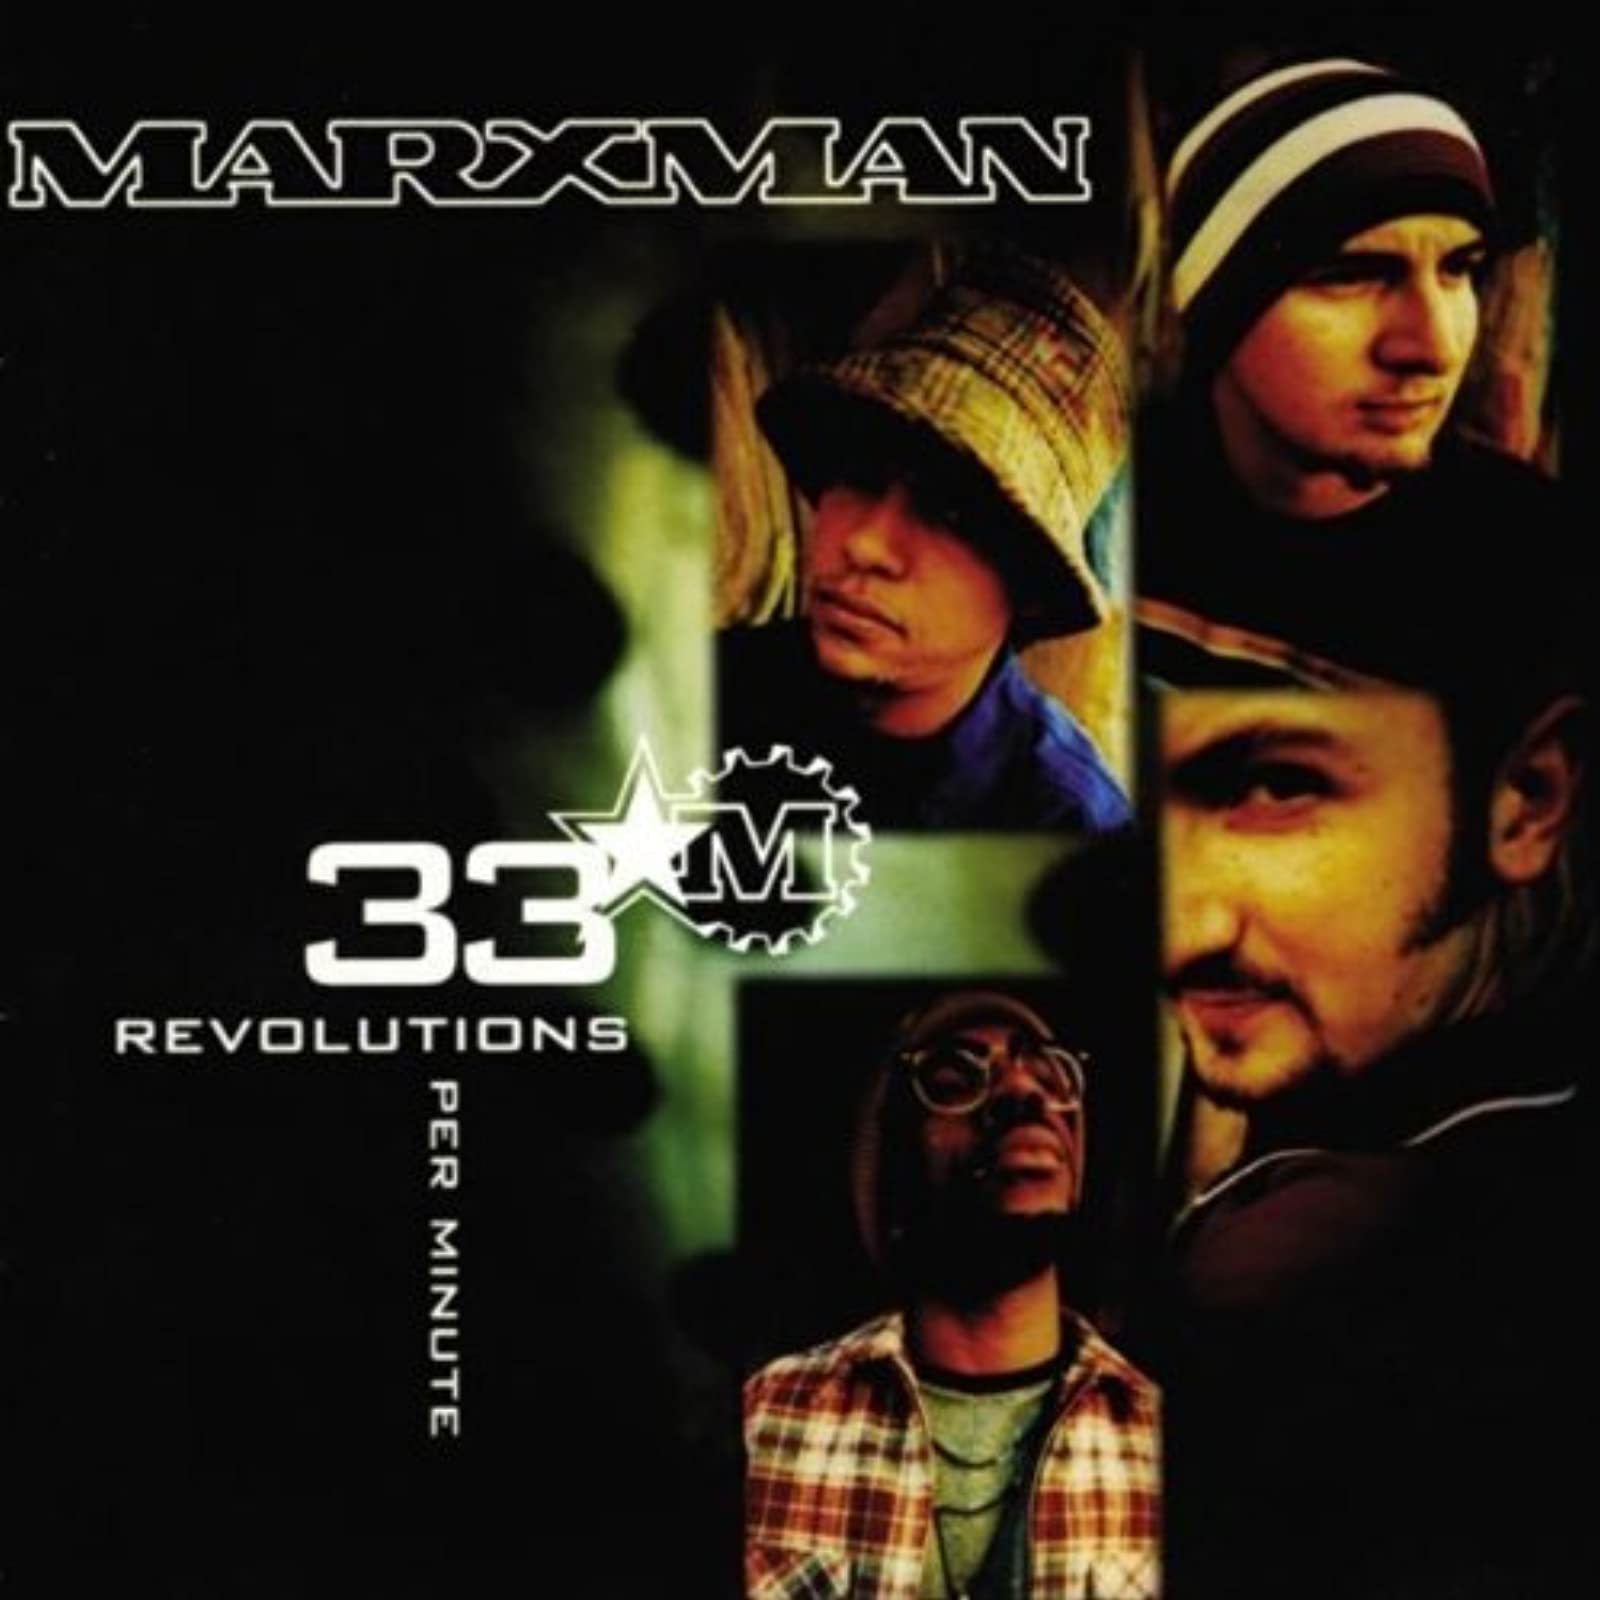 33 Revolutions Per Minute By Marxman On Audio CD Album 1994